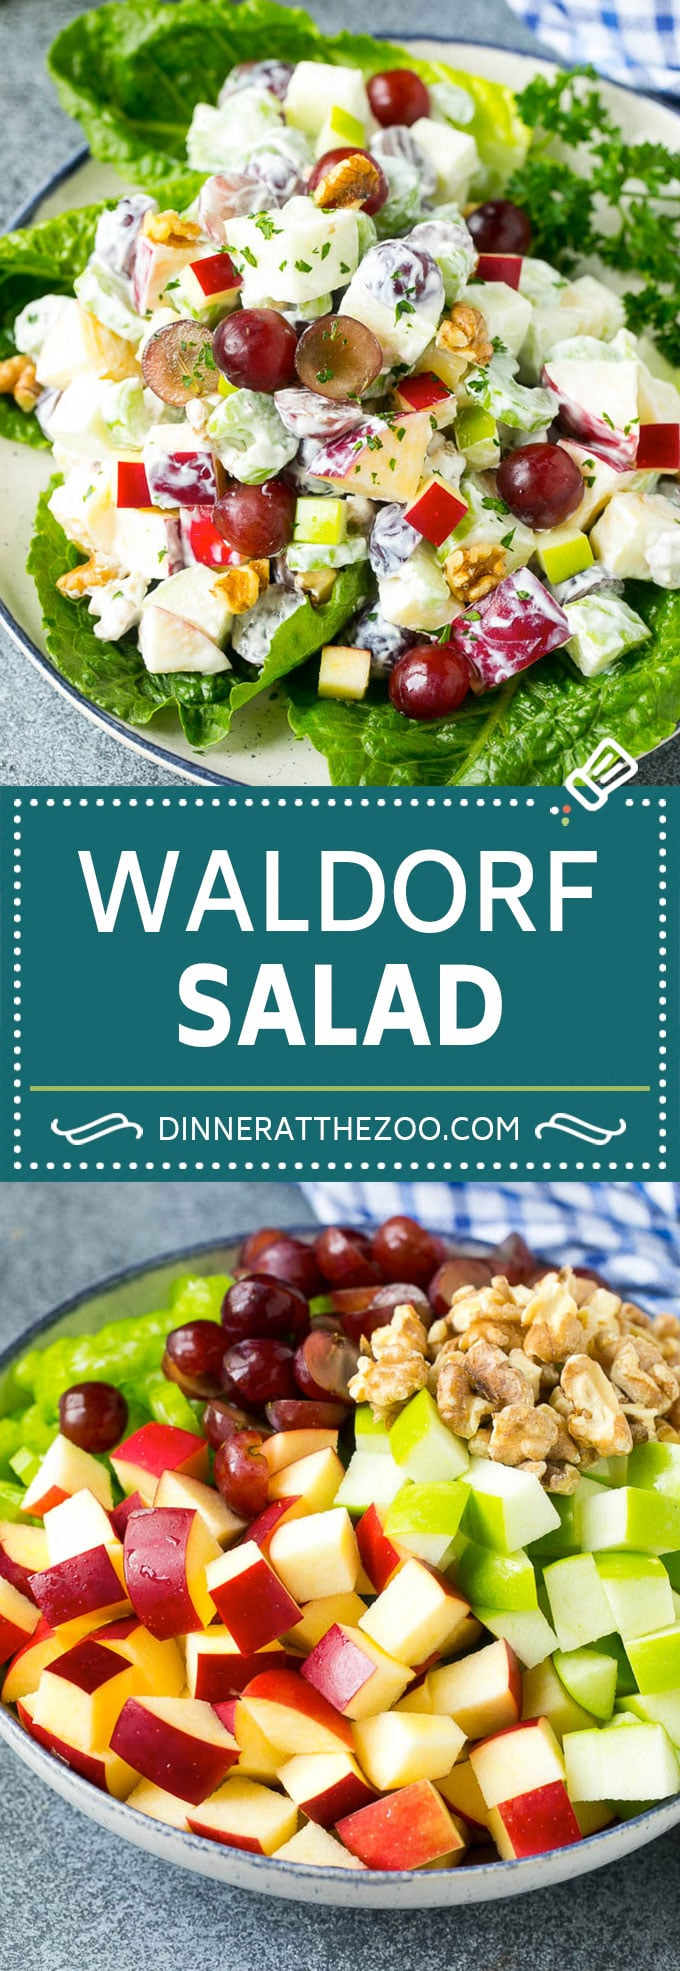 Waldorf Salad Recipe | Apple Salad | Fruit Salad #salad #fruit #apples #grapes #lunch #dinneratthezoo #glutenfree